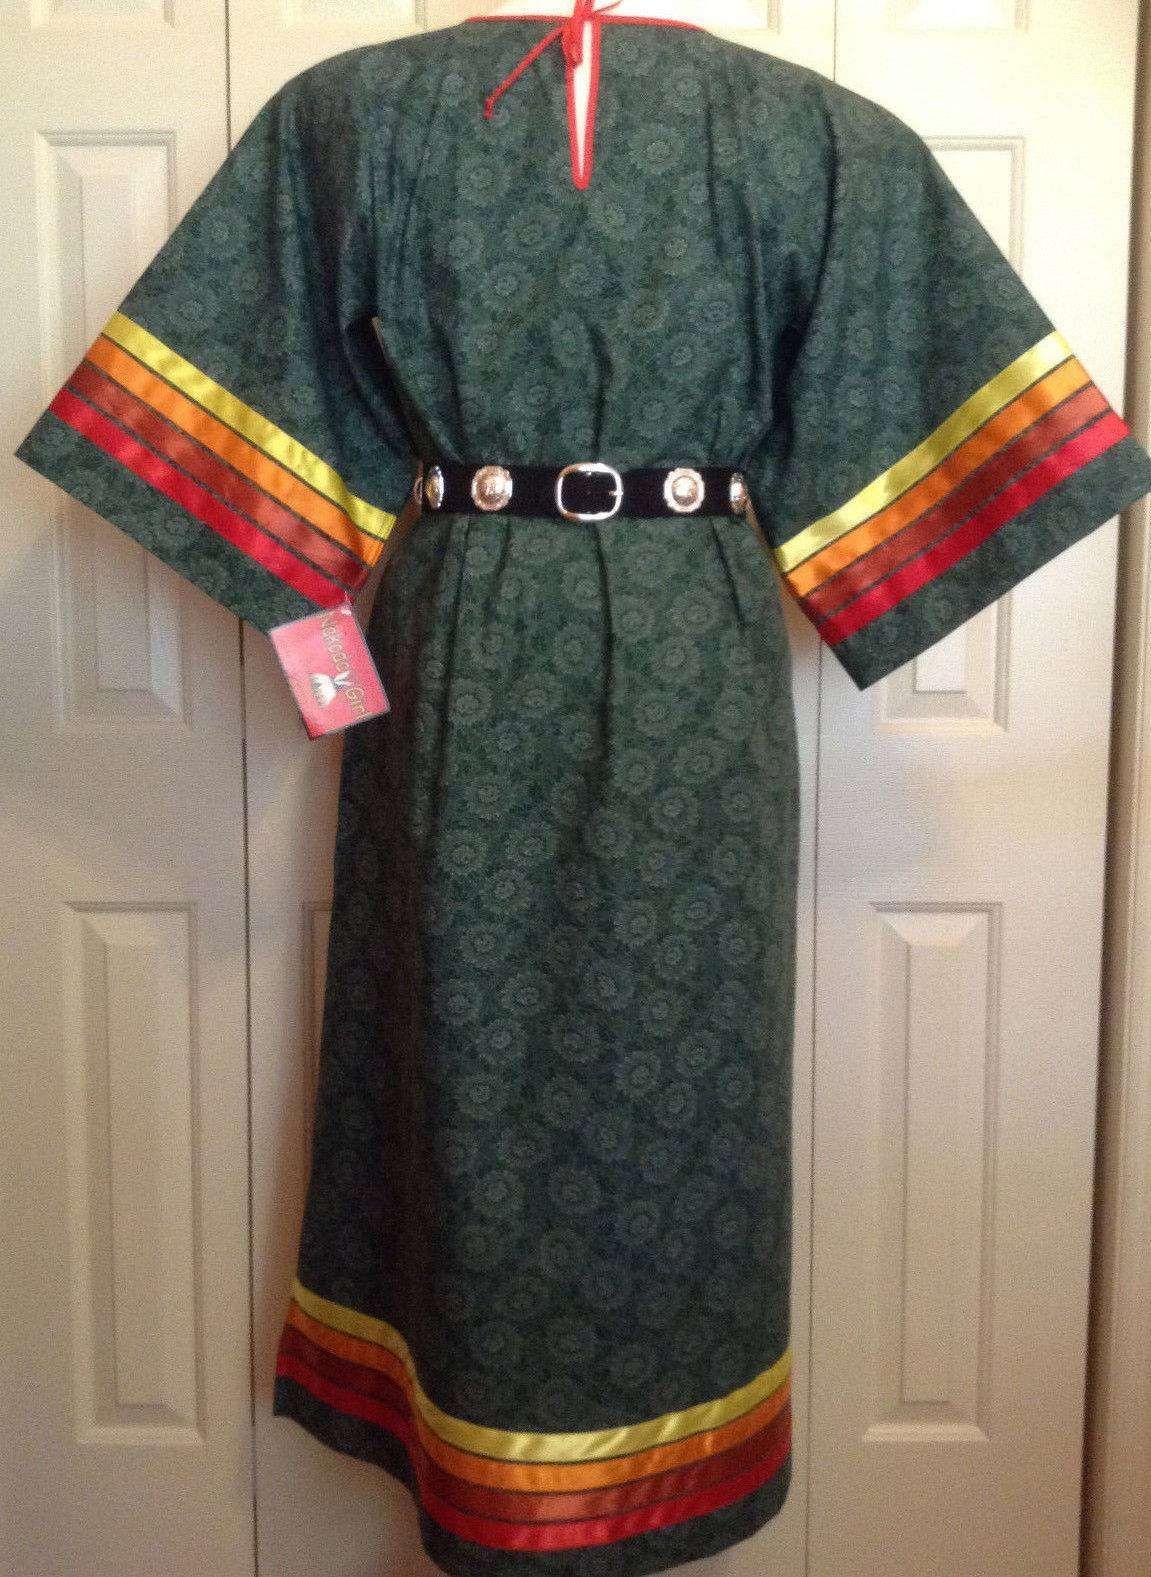 f201efeec4 Native American Regalia*NAKODA MADE*Ladies Pow Wow GREEN Ribbon Dress Size  18-20 – eBay find of the week